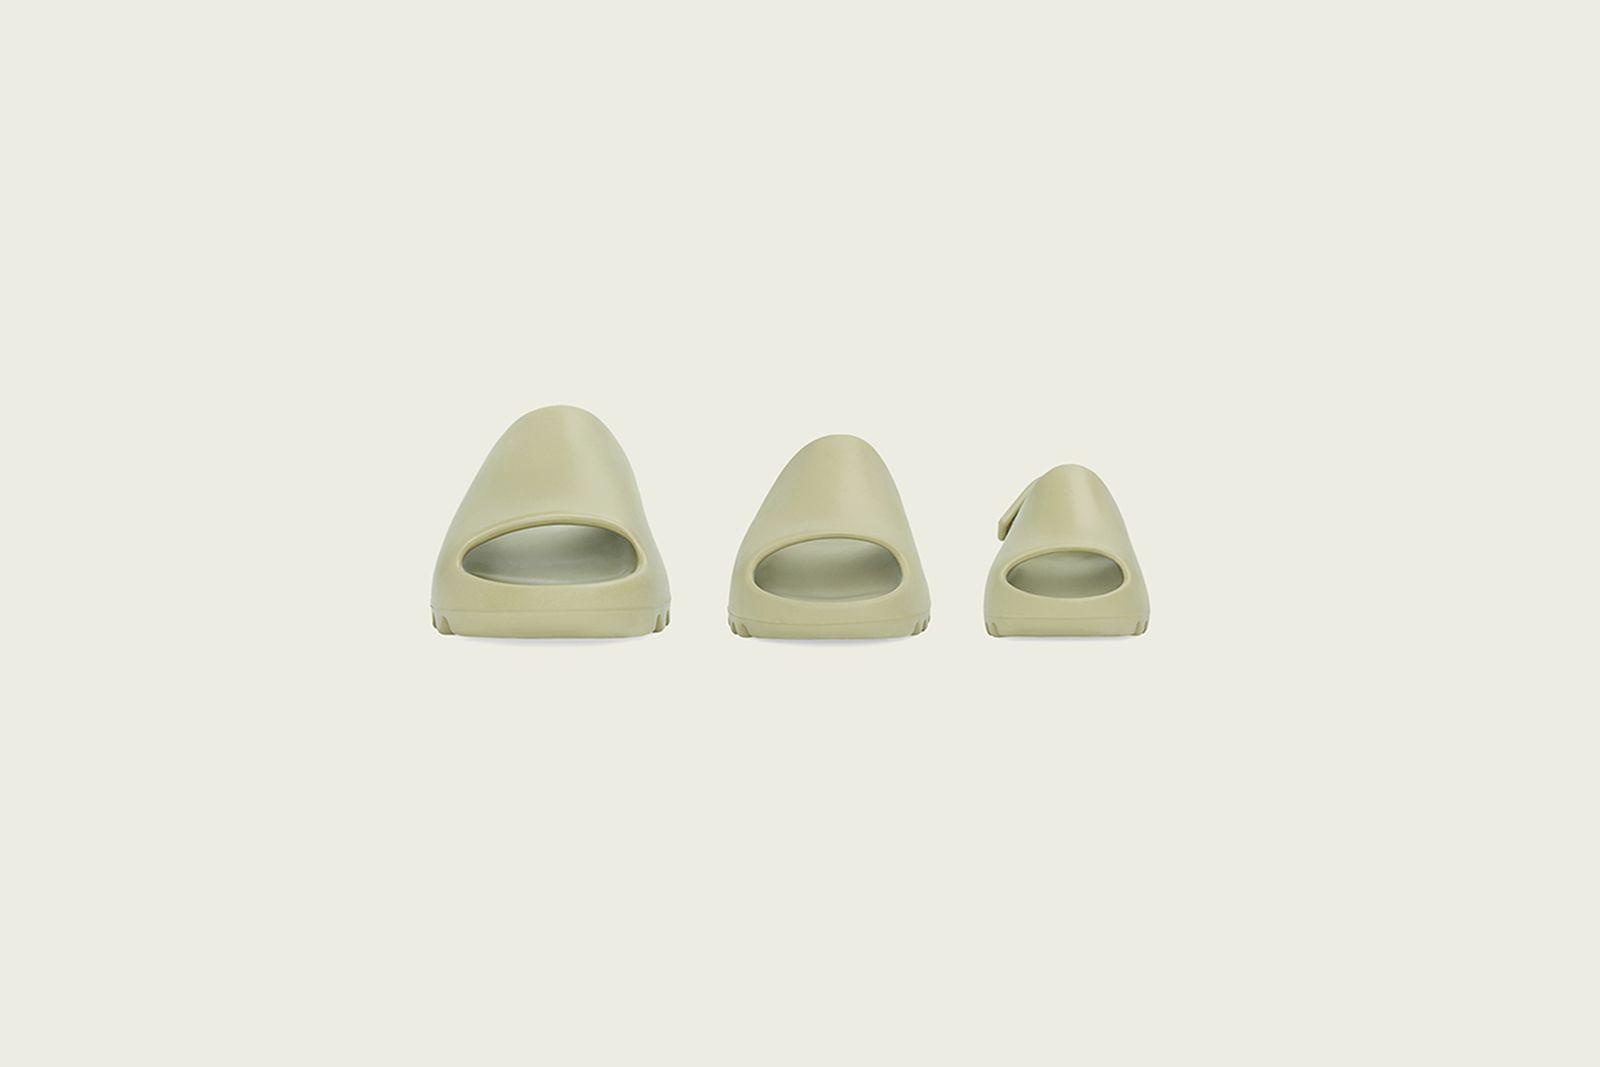 adidas-yeezy-slide-release-date-price-13